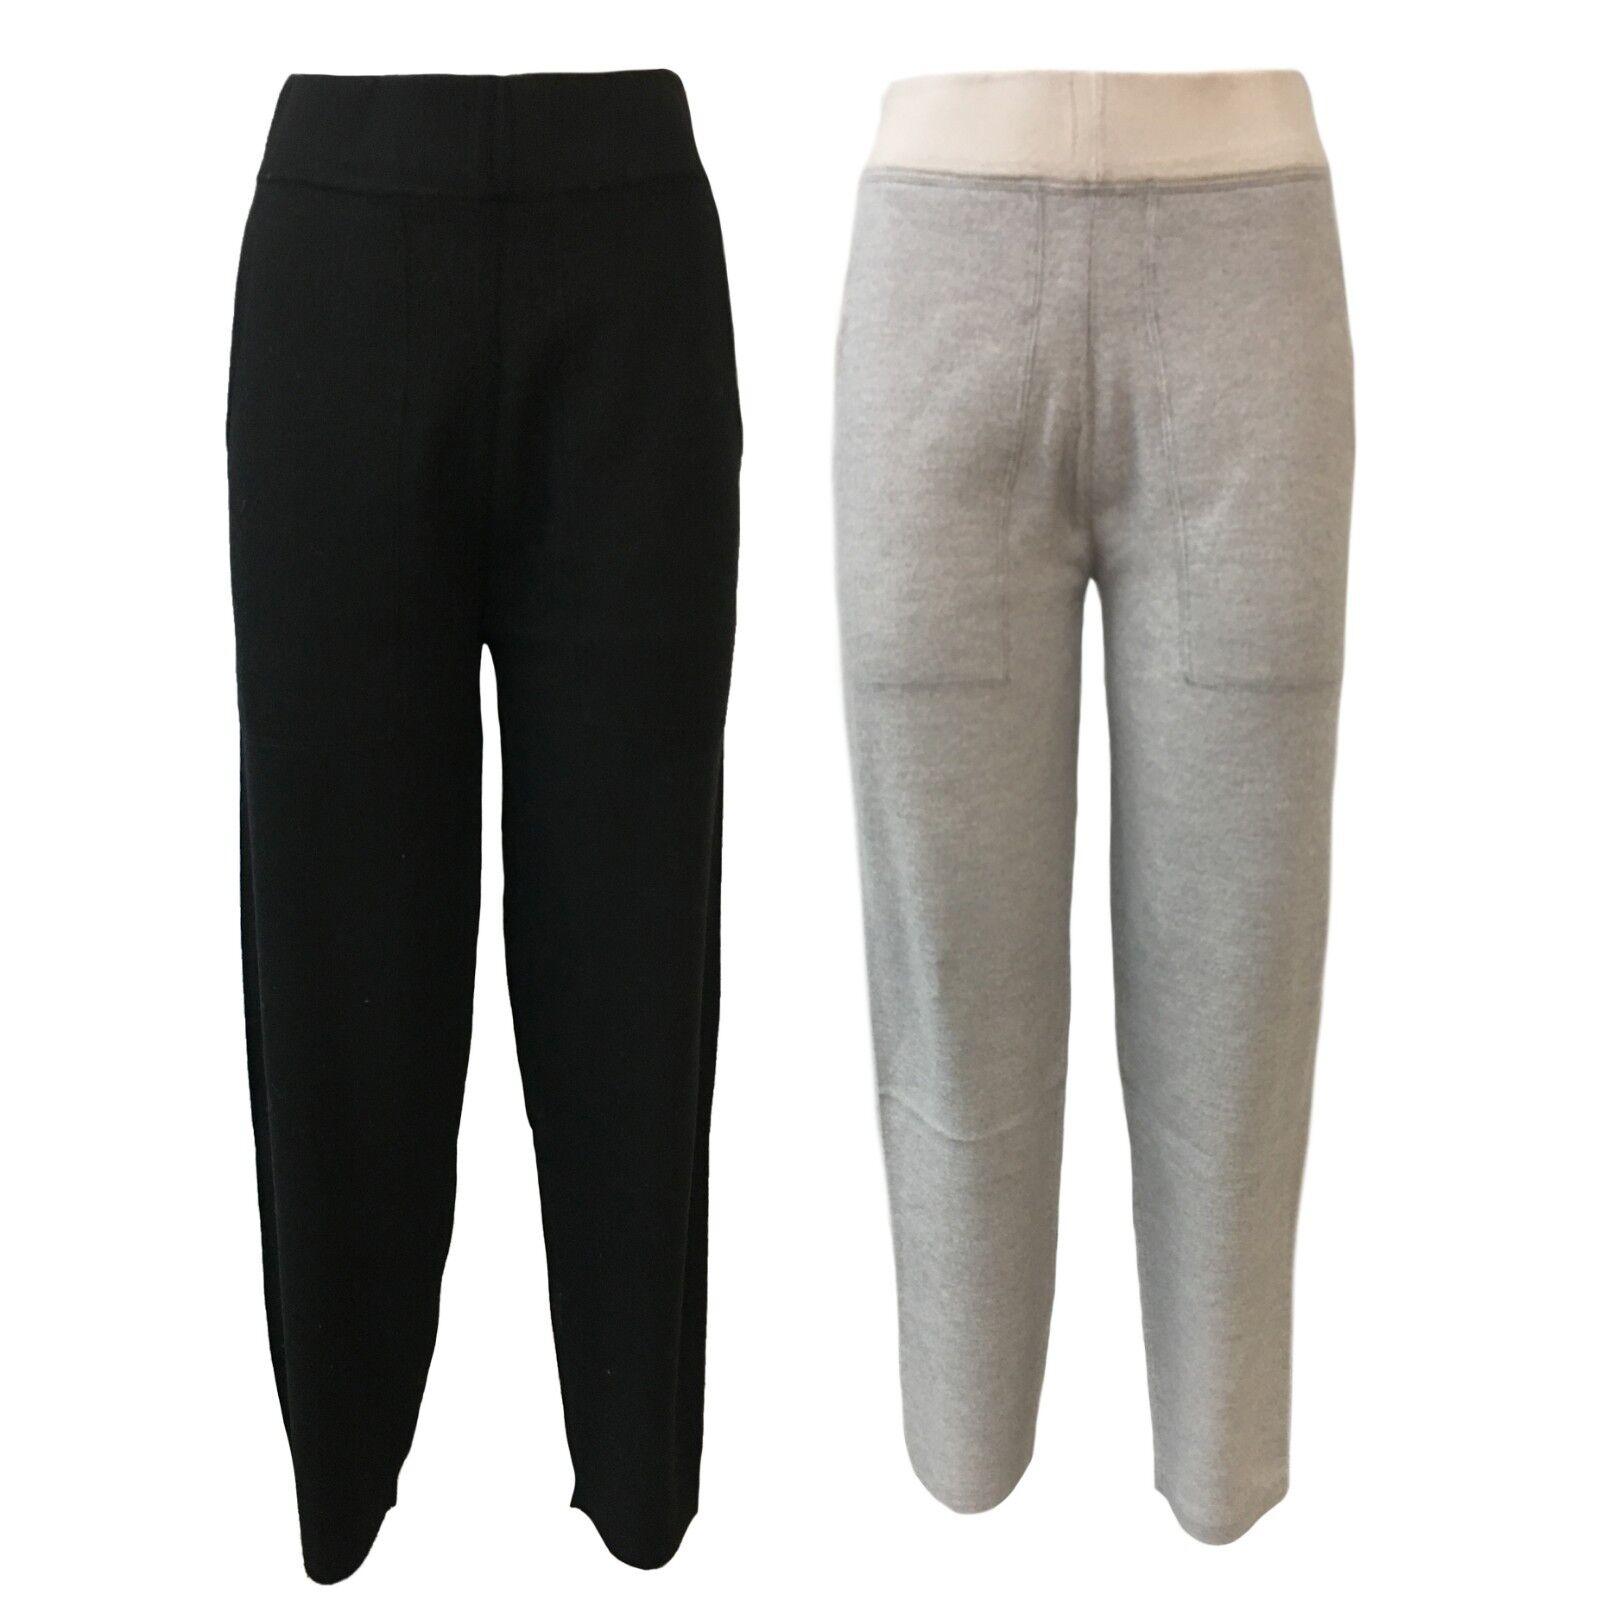 0cd6f07ae80e ALPHA STUDIO donna tasche mod AD-7152Q 100% lana pantalone con  nnljlk919-Pantaloni